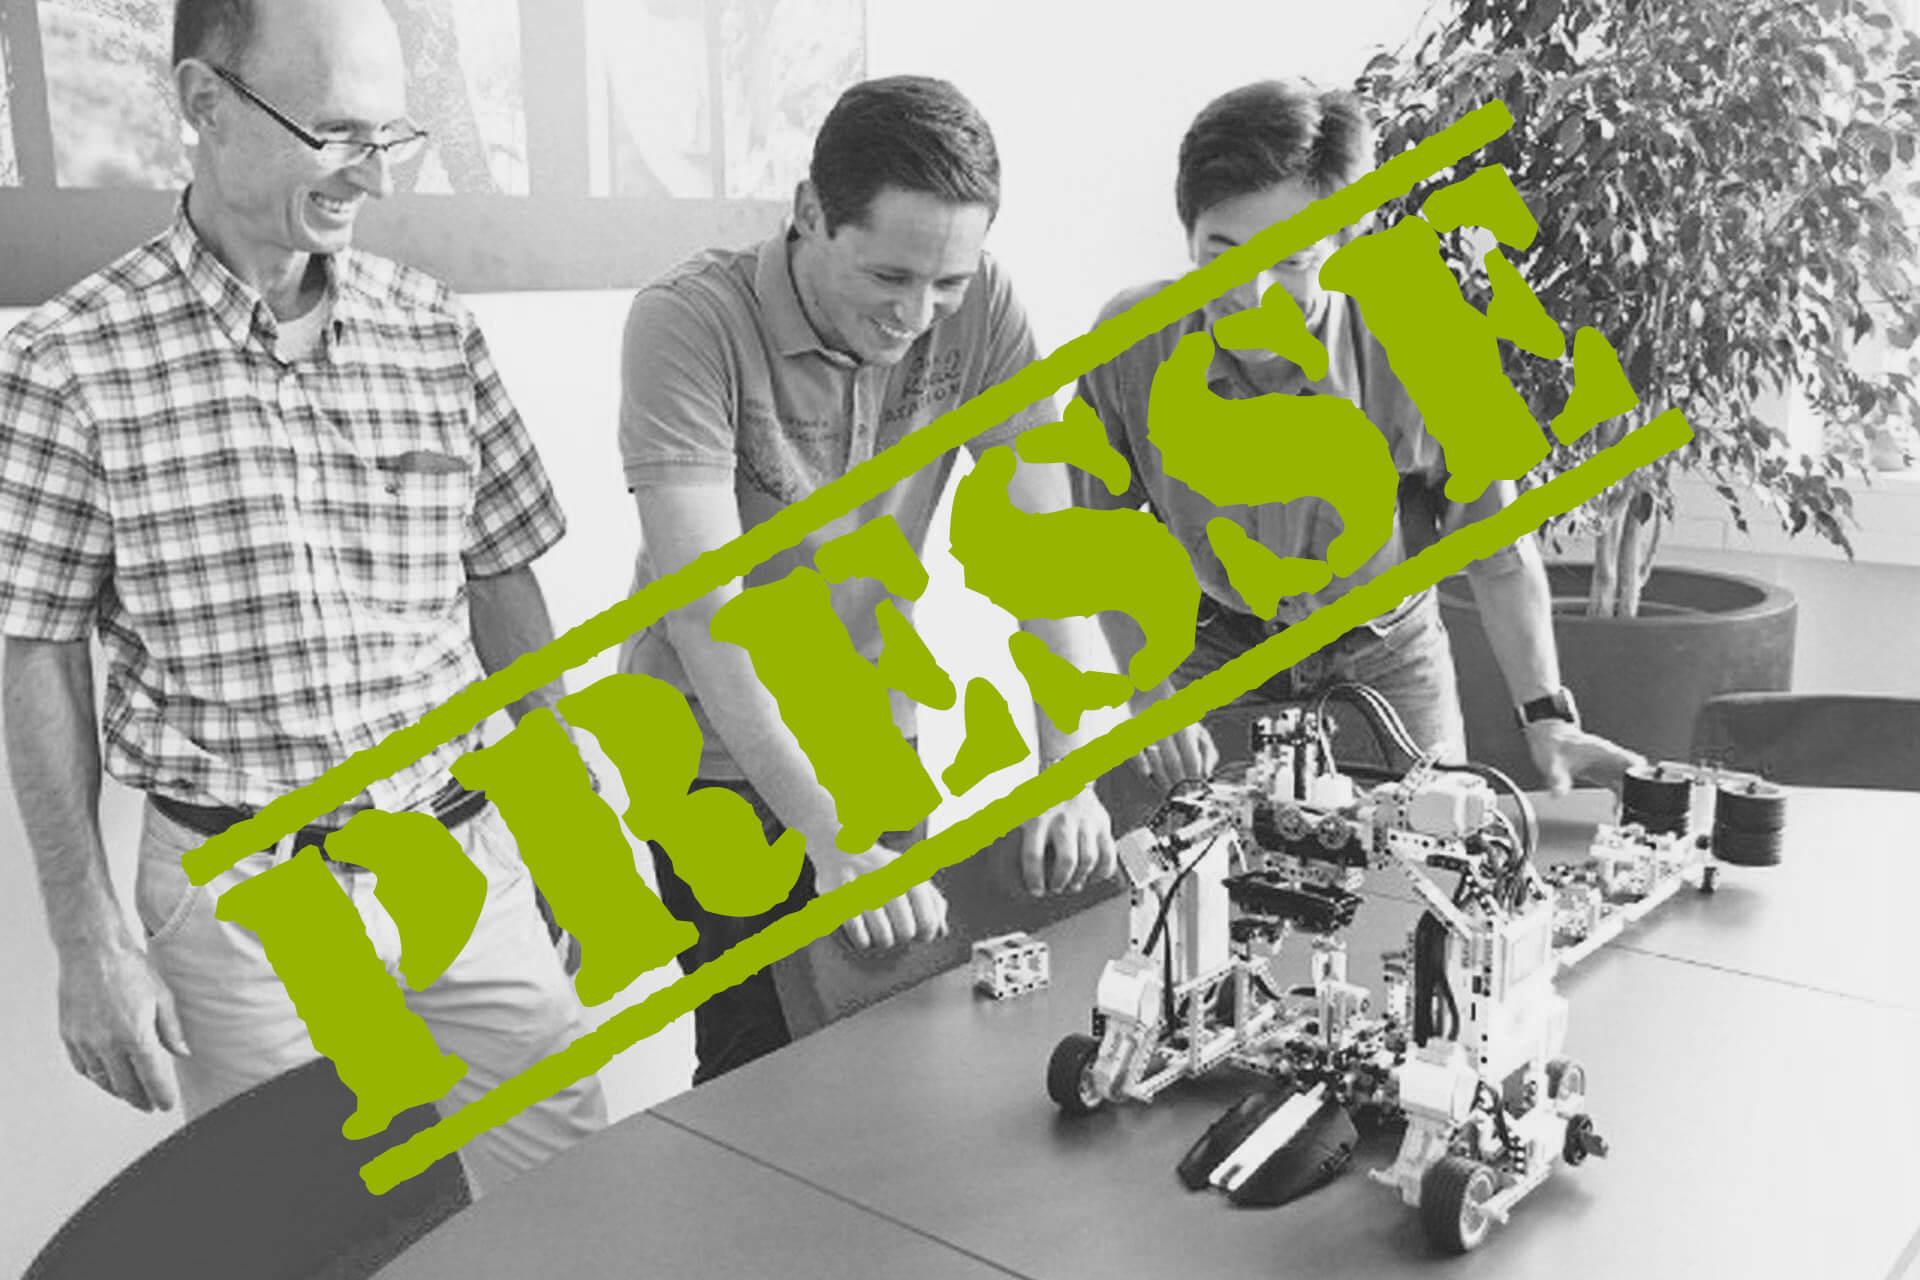 Lernen Mit Lego-Roboter